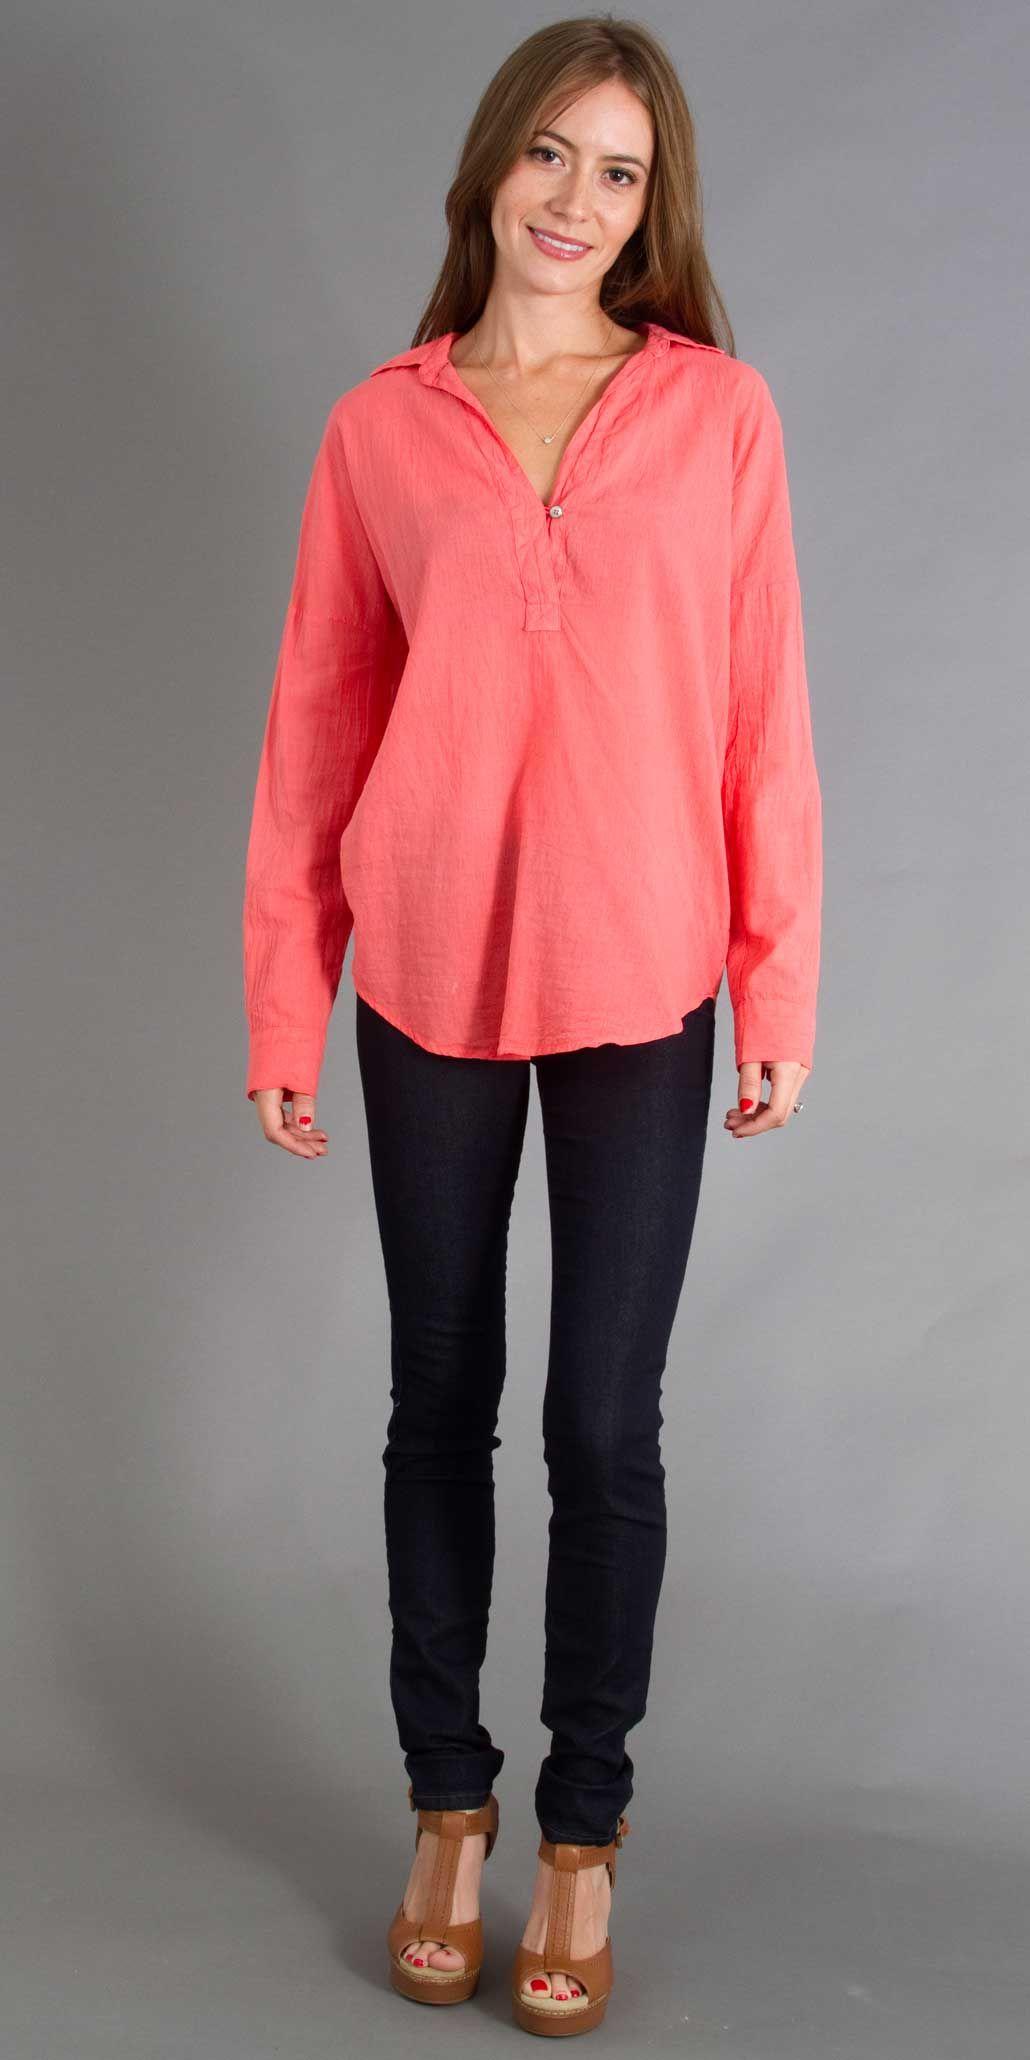 Splendid Shirtling One Button Cotton Tunic in Blaze. $98.00